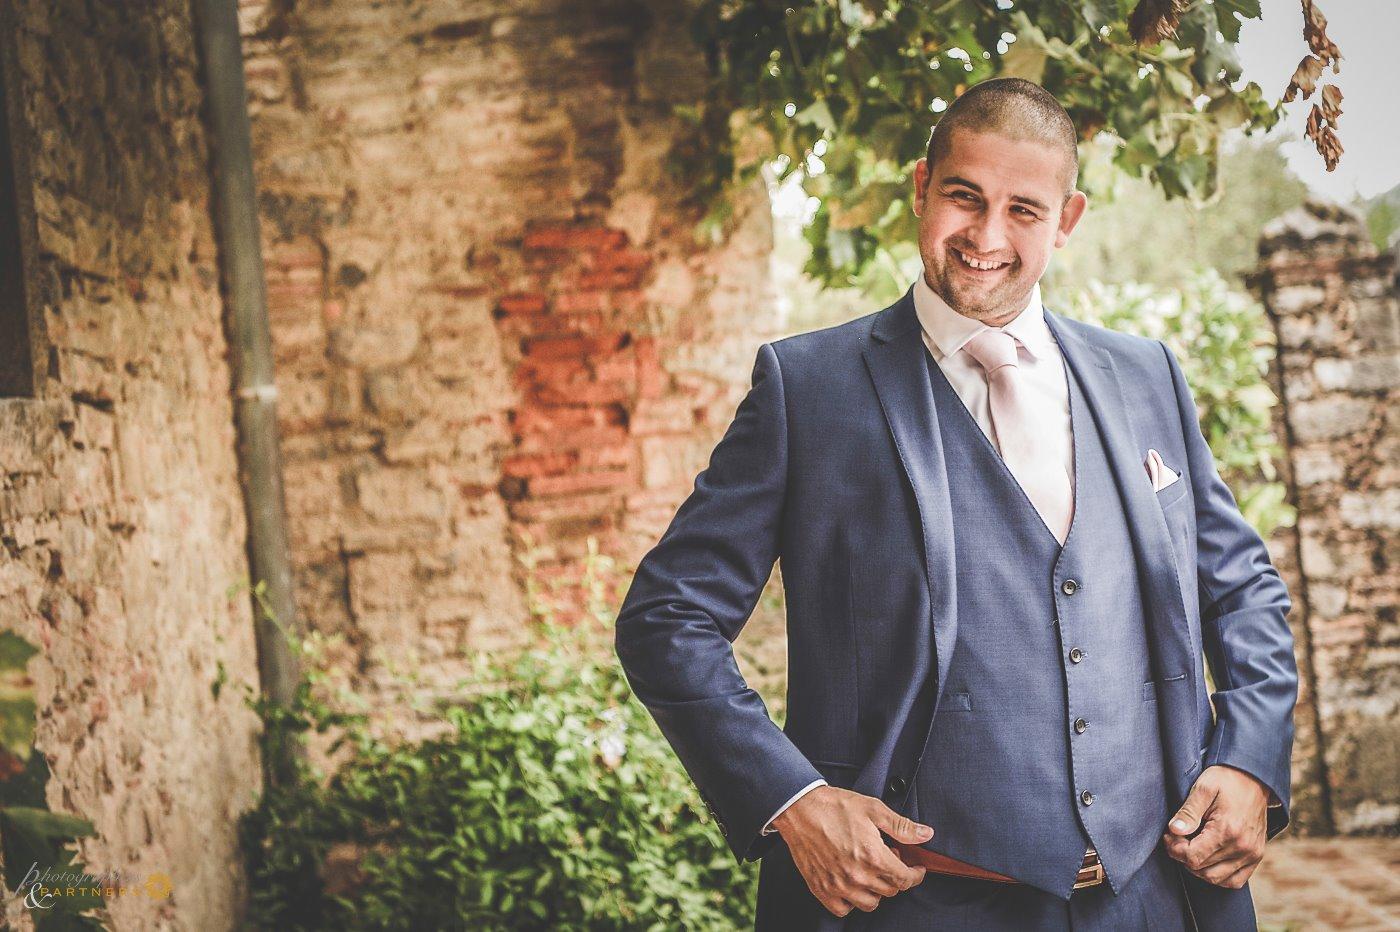 photography_weddings_catureglio_03.jpg